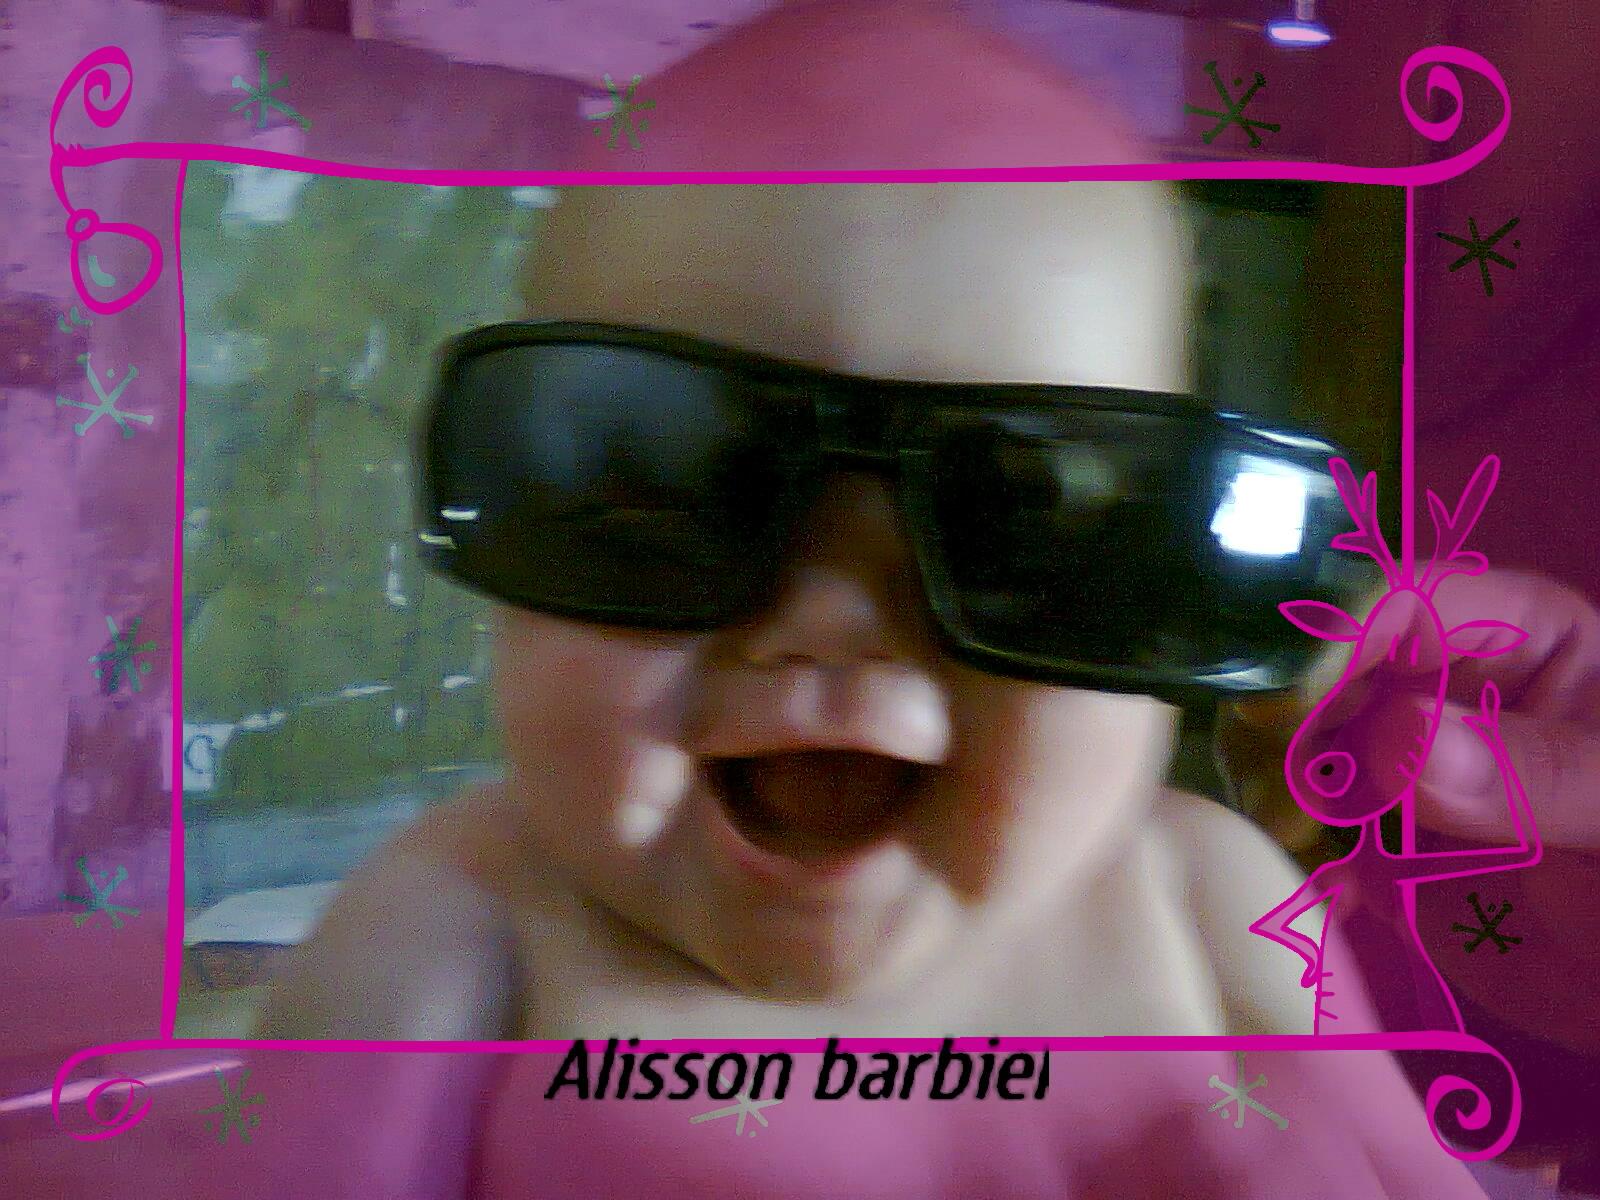 ALISSON BARBIEL